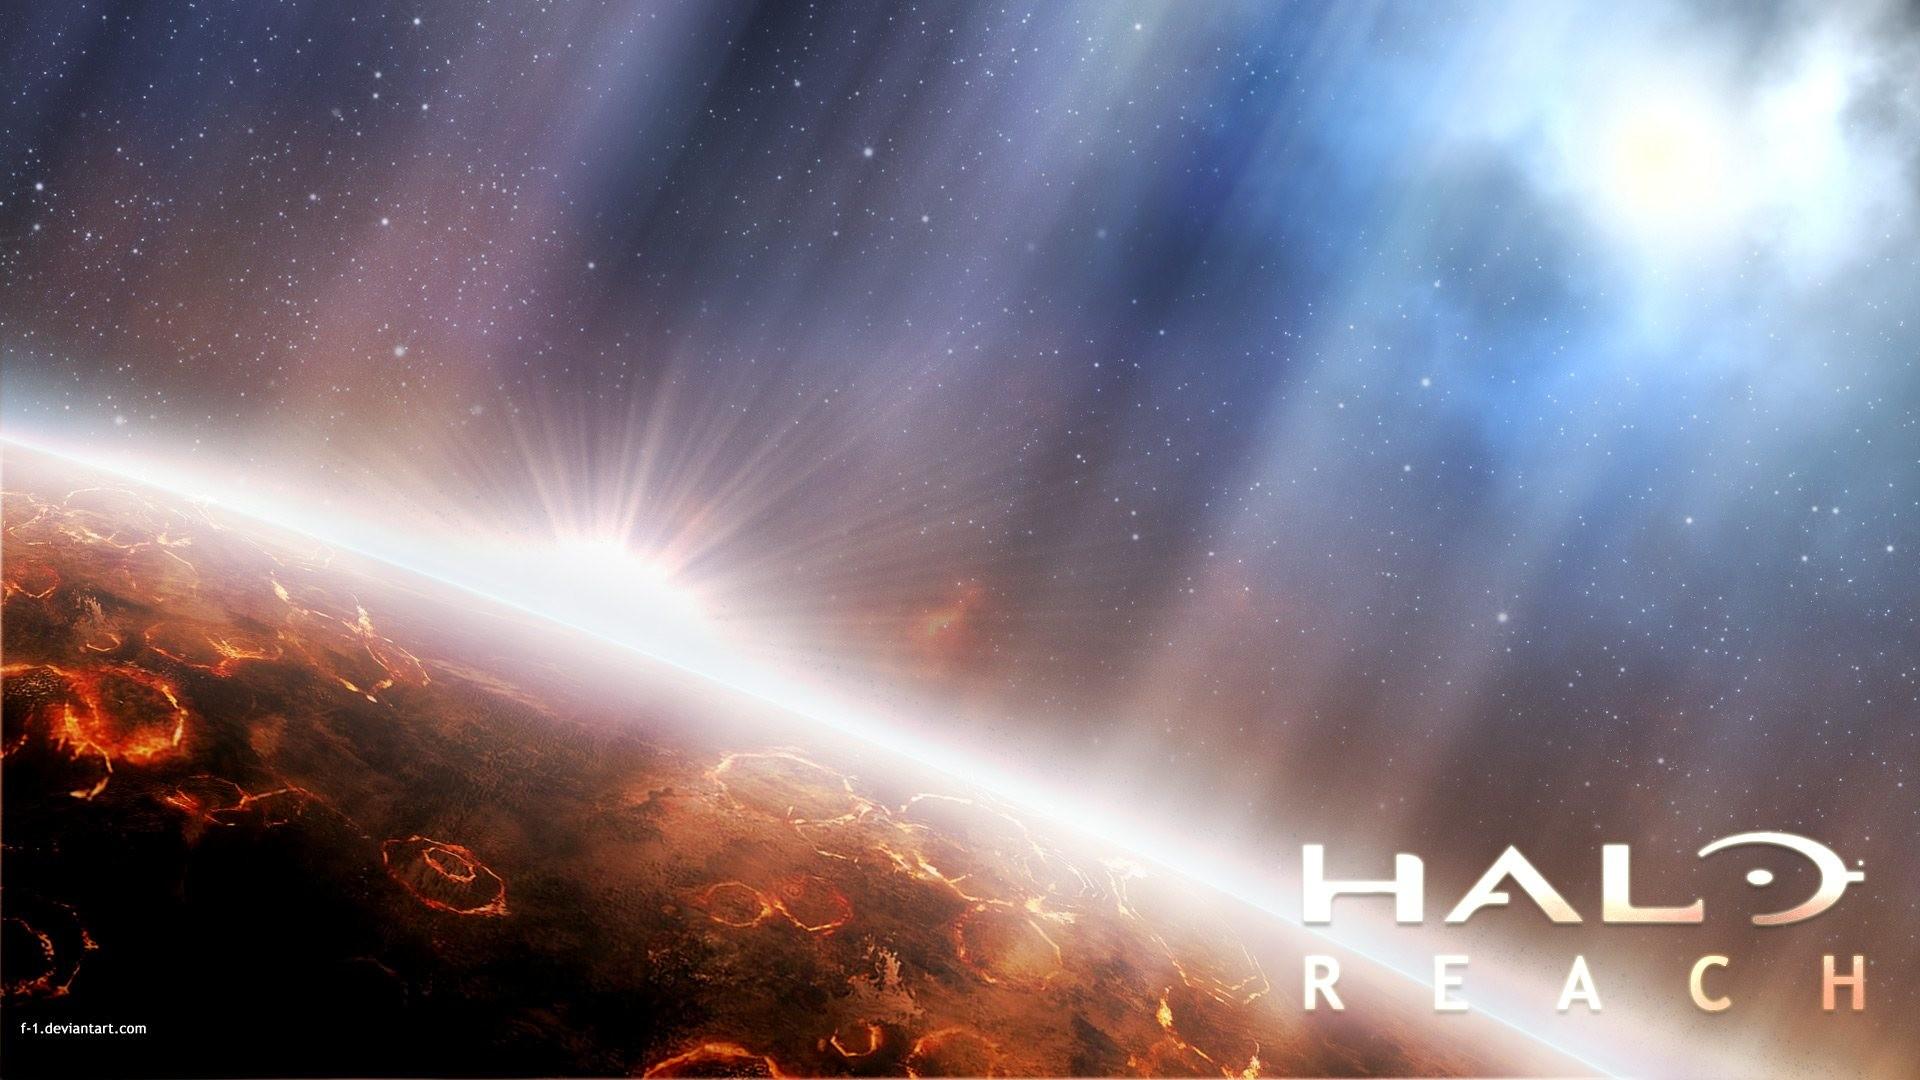 Res: 1920x1080, DOWNLOAD Source · Halo reach hd wallpaper SF Wallpaper